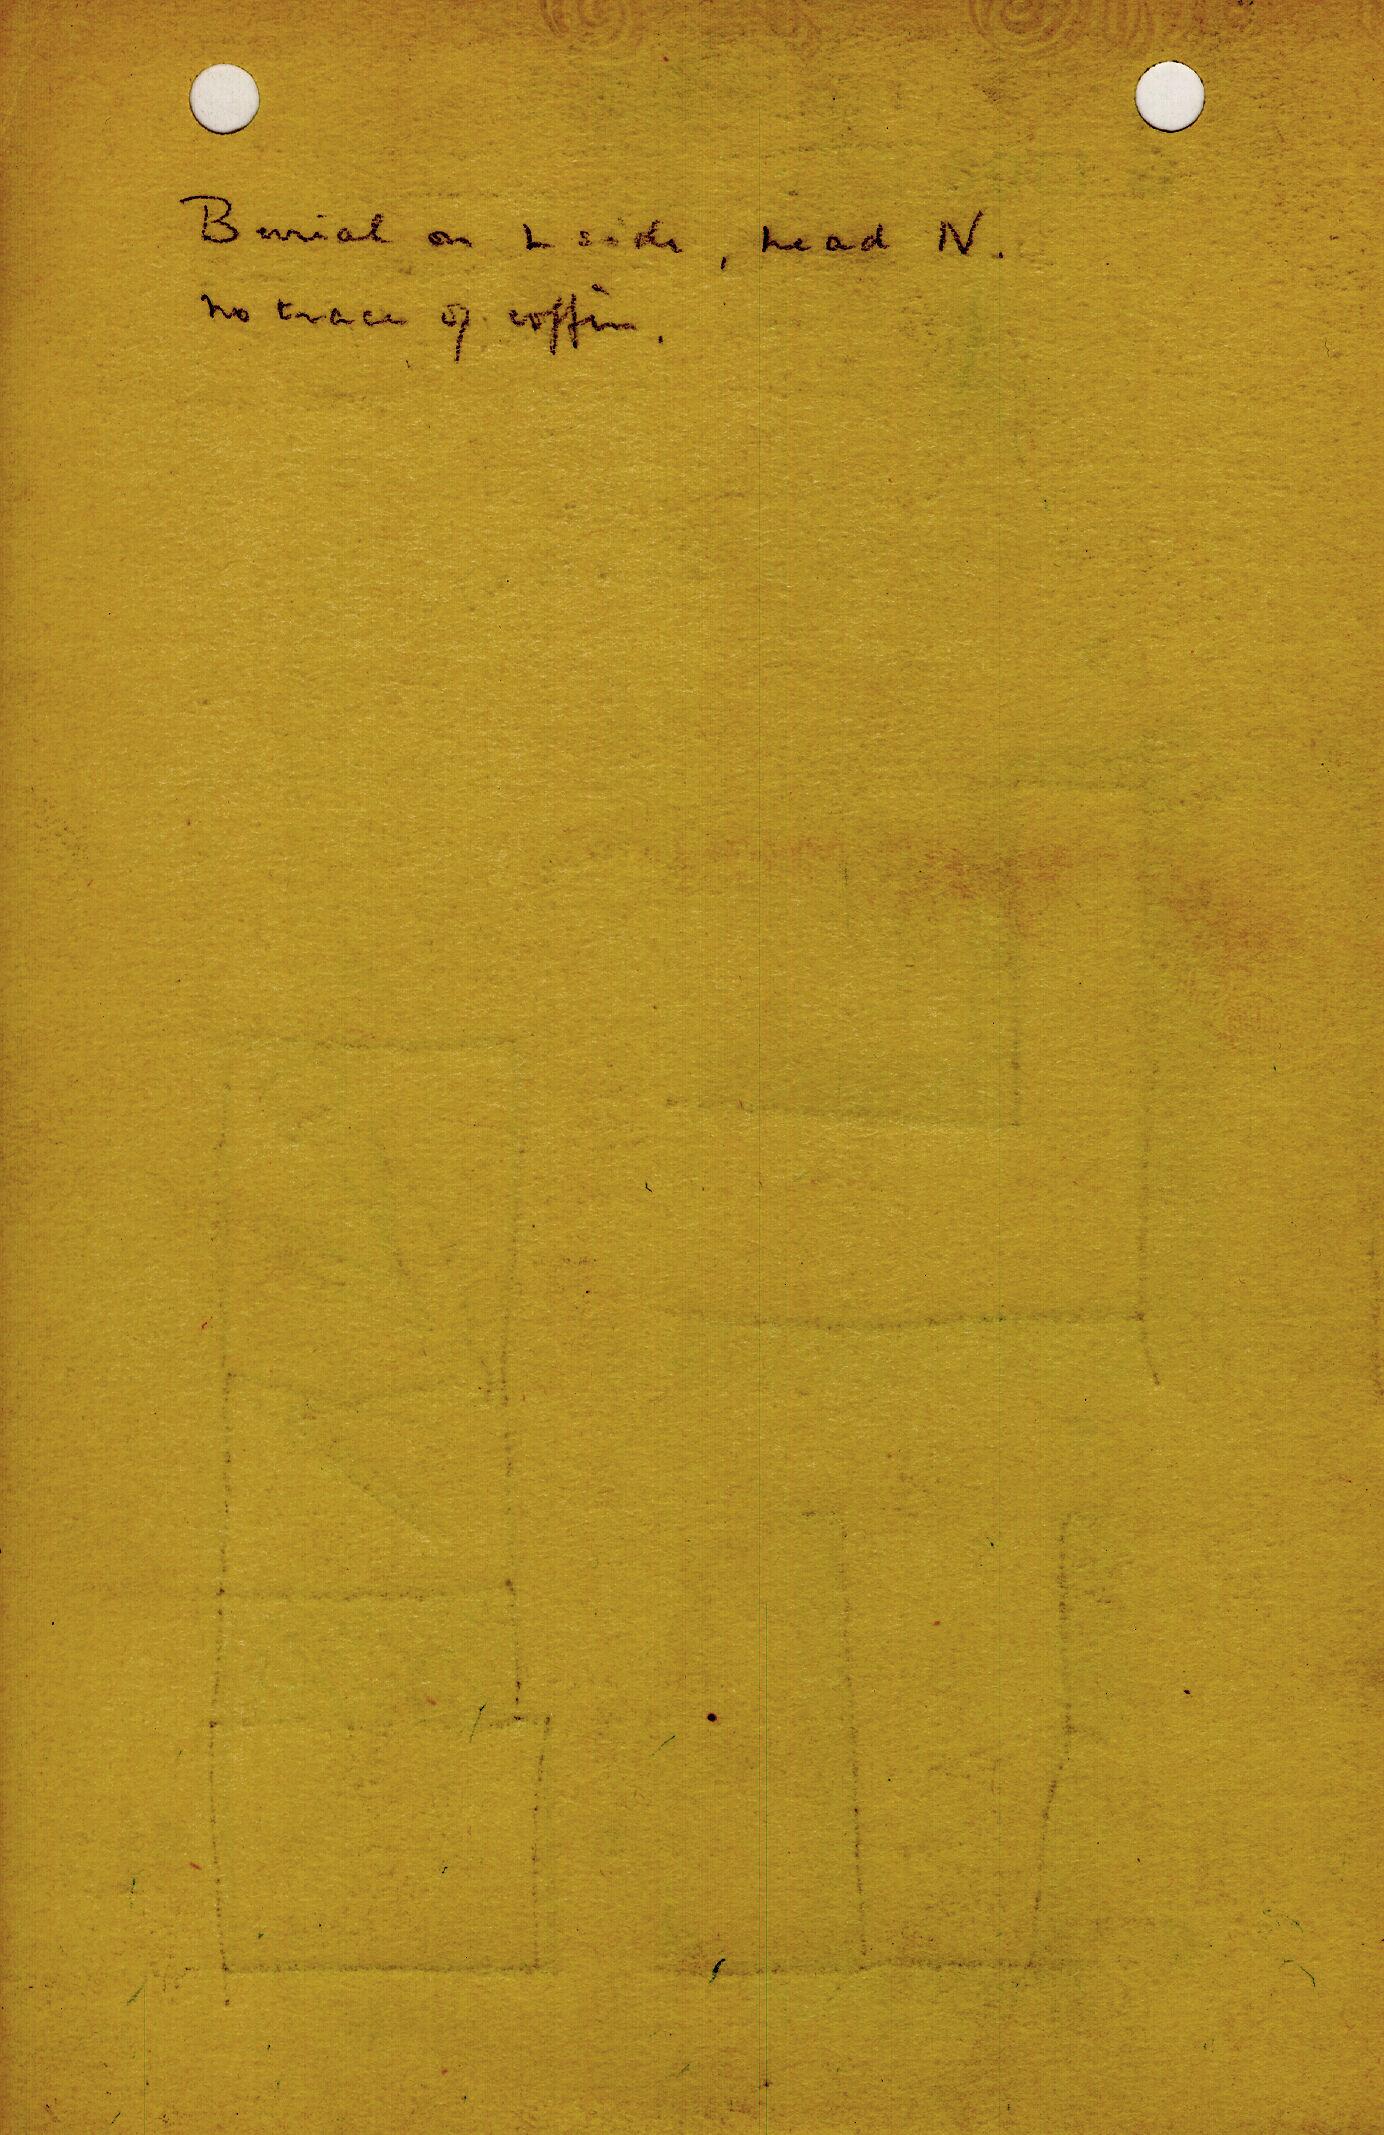 Notes: G 1308, Shaft E, notes